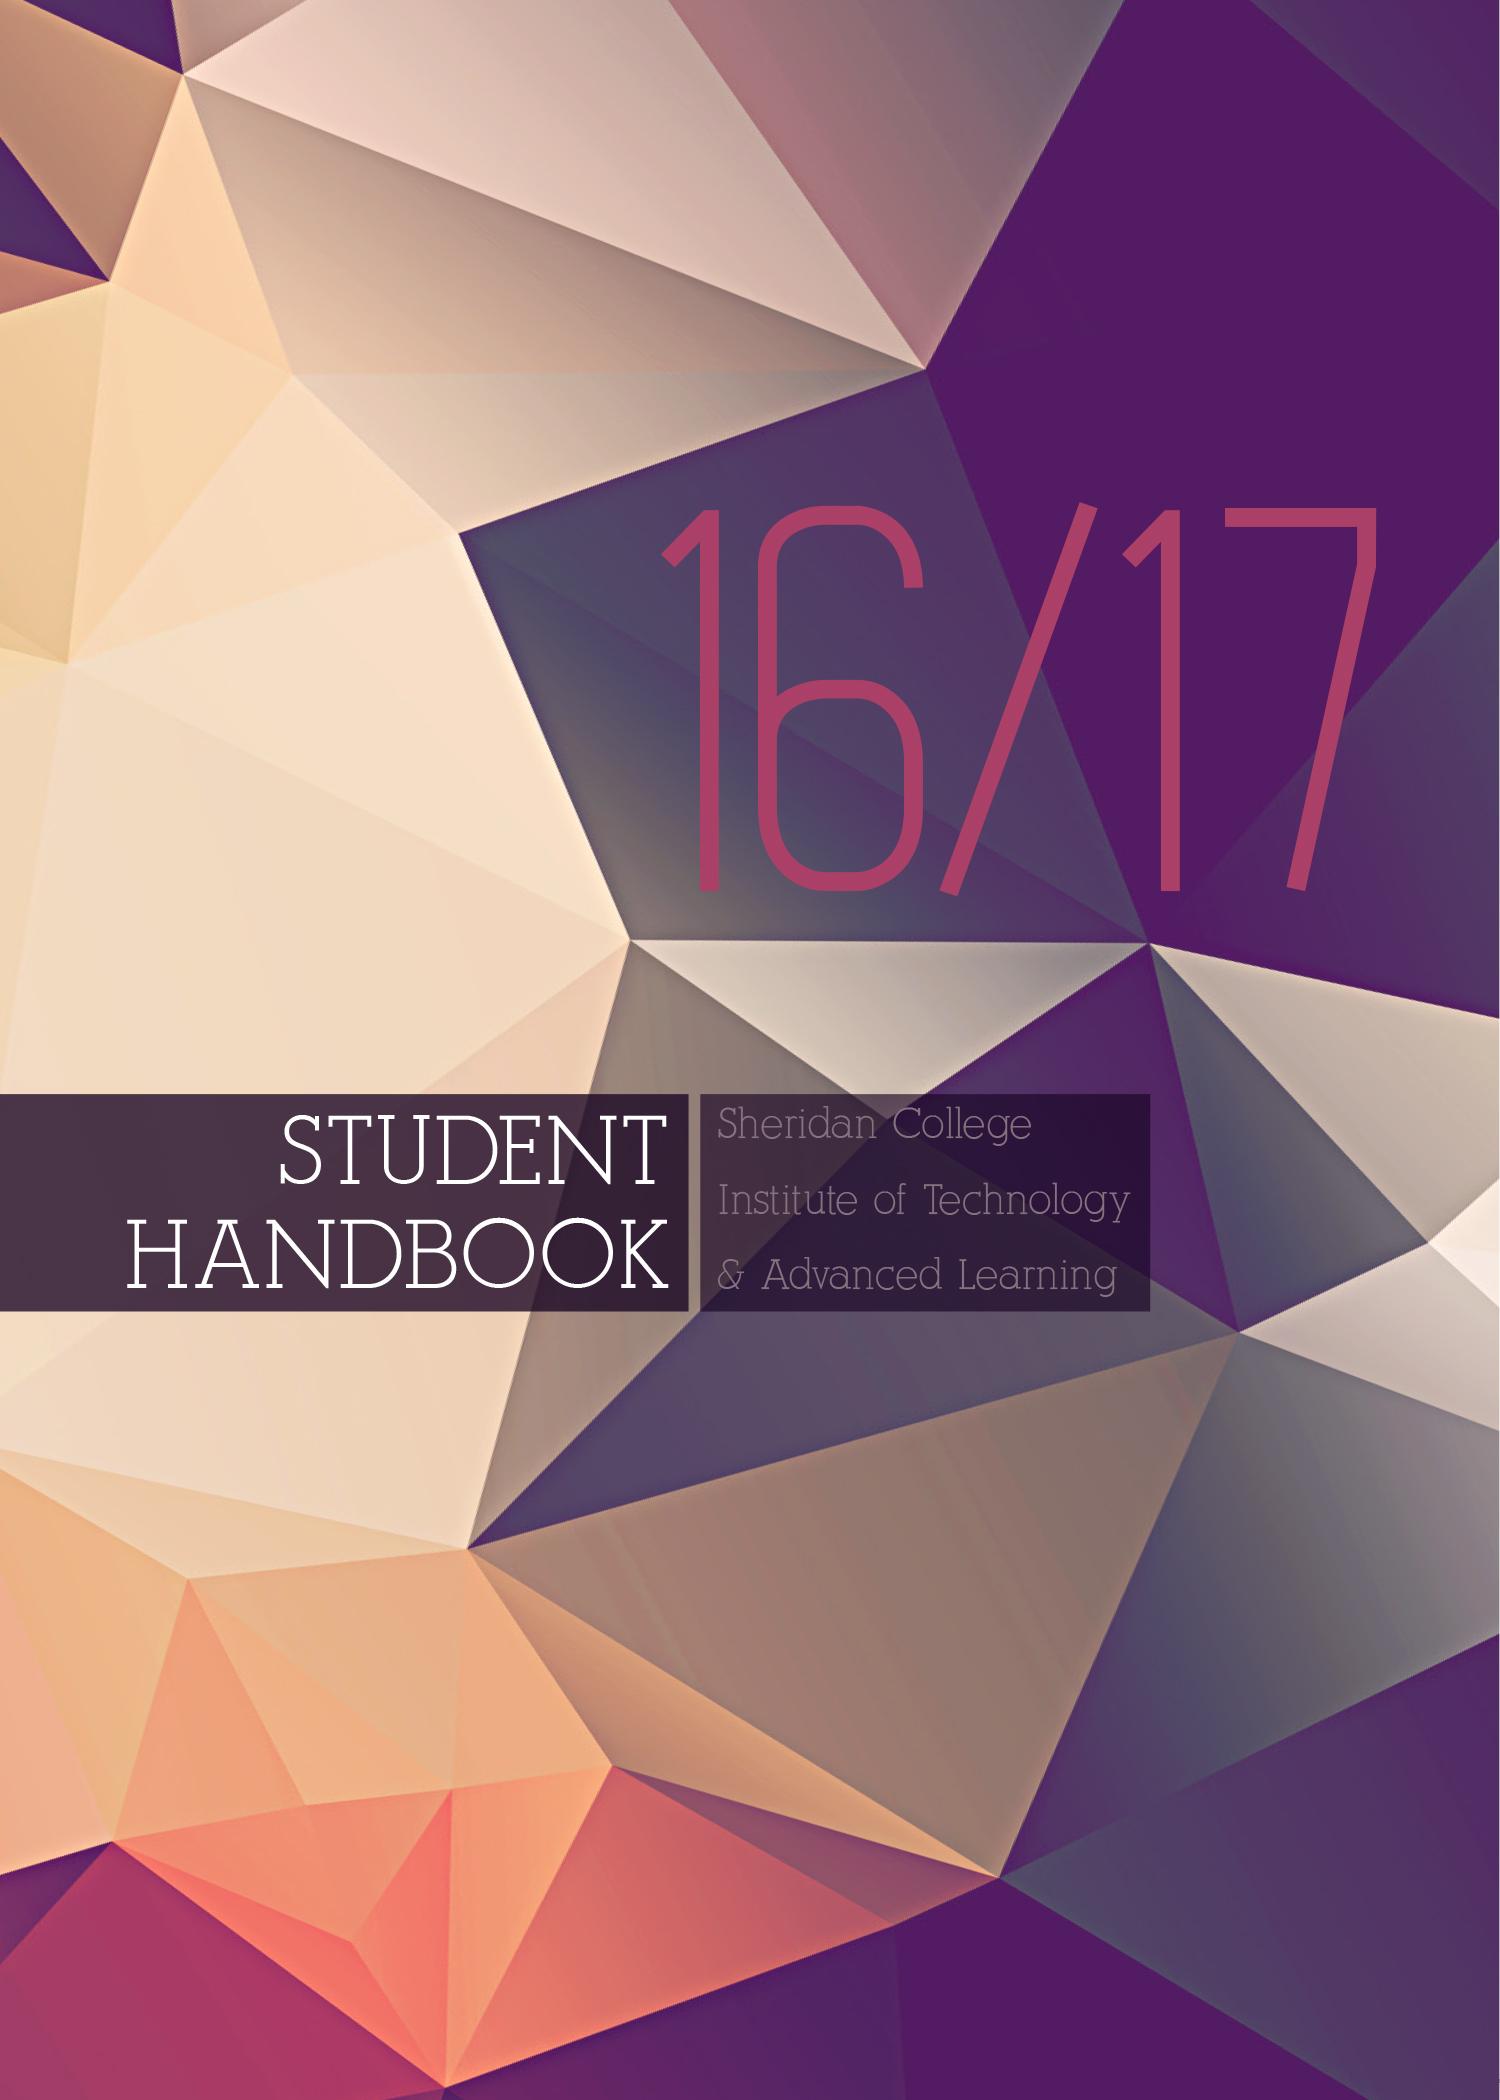 Student Handbook FINAL PRINT_Kate Traynor.jpg